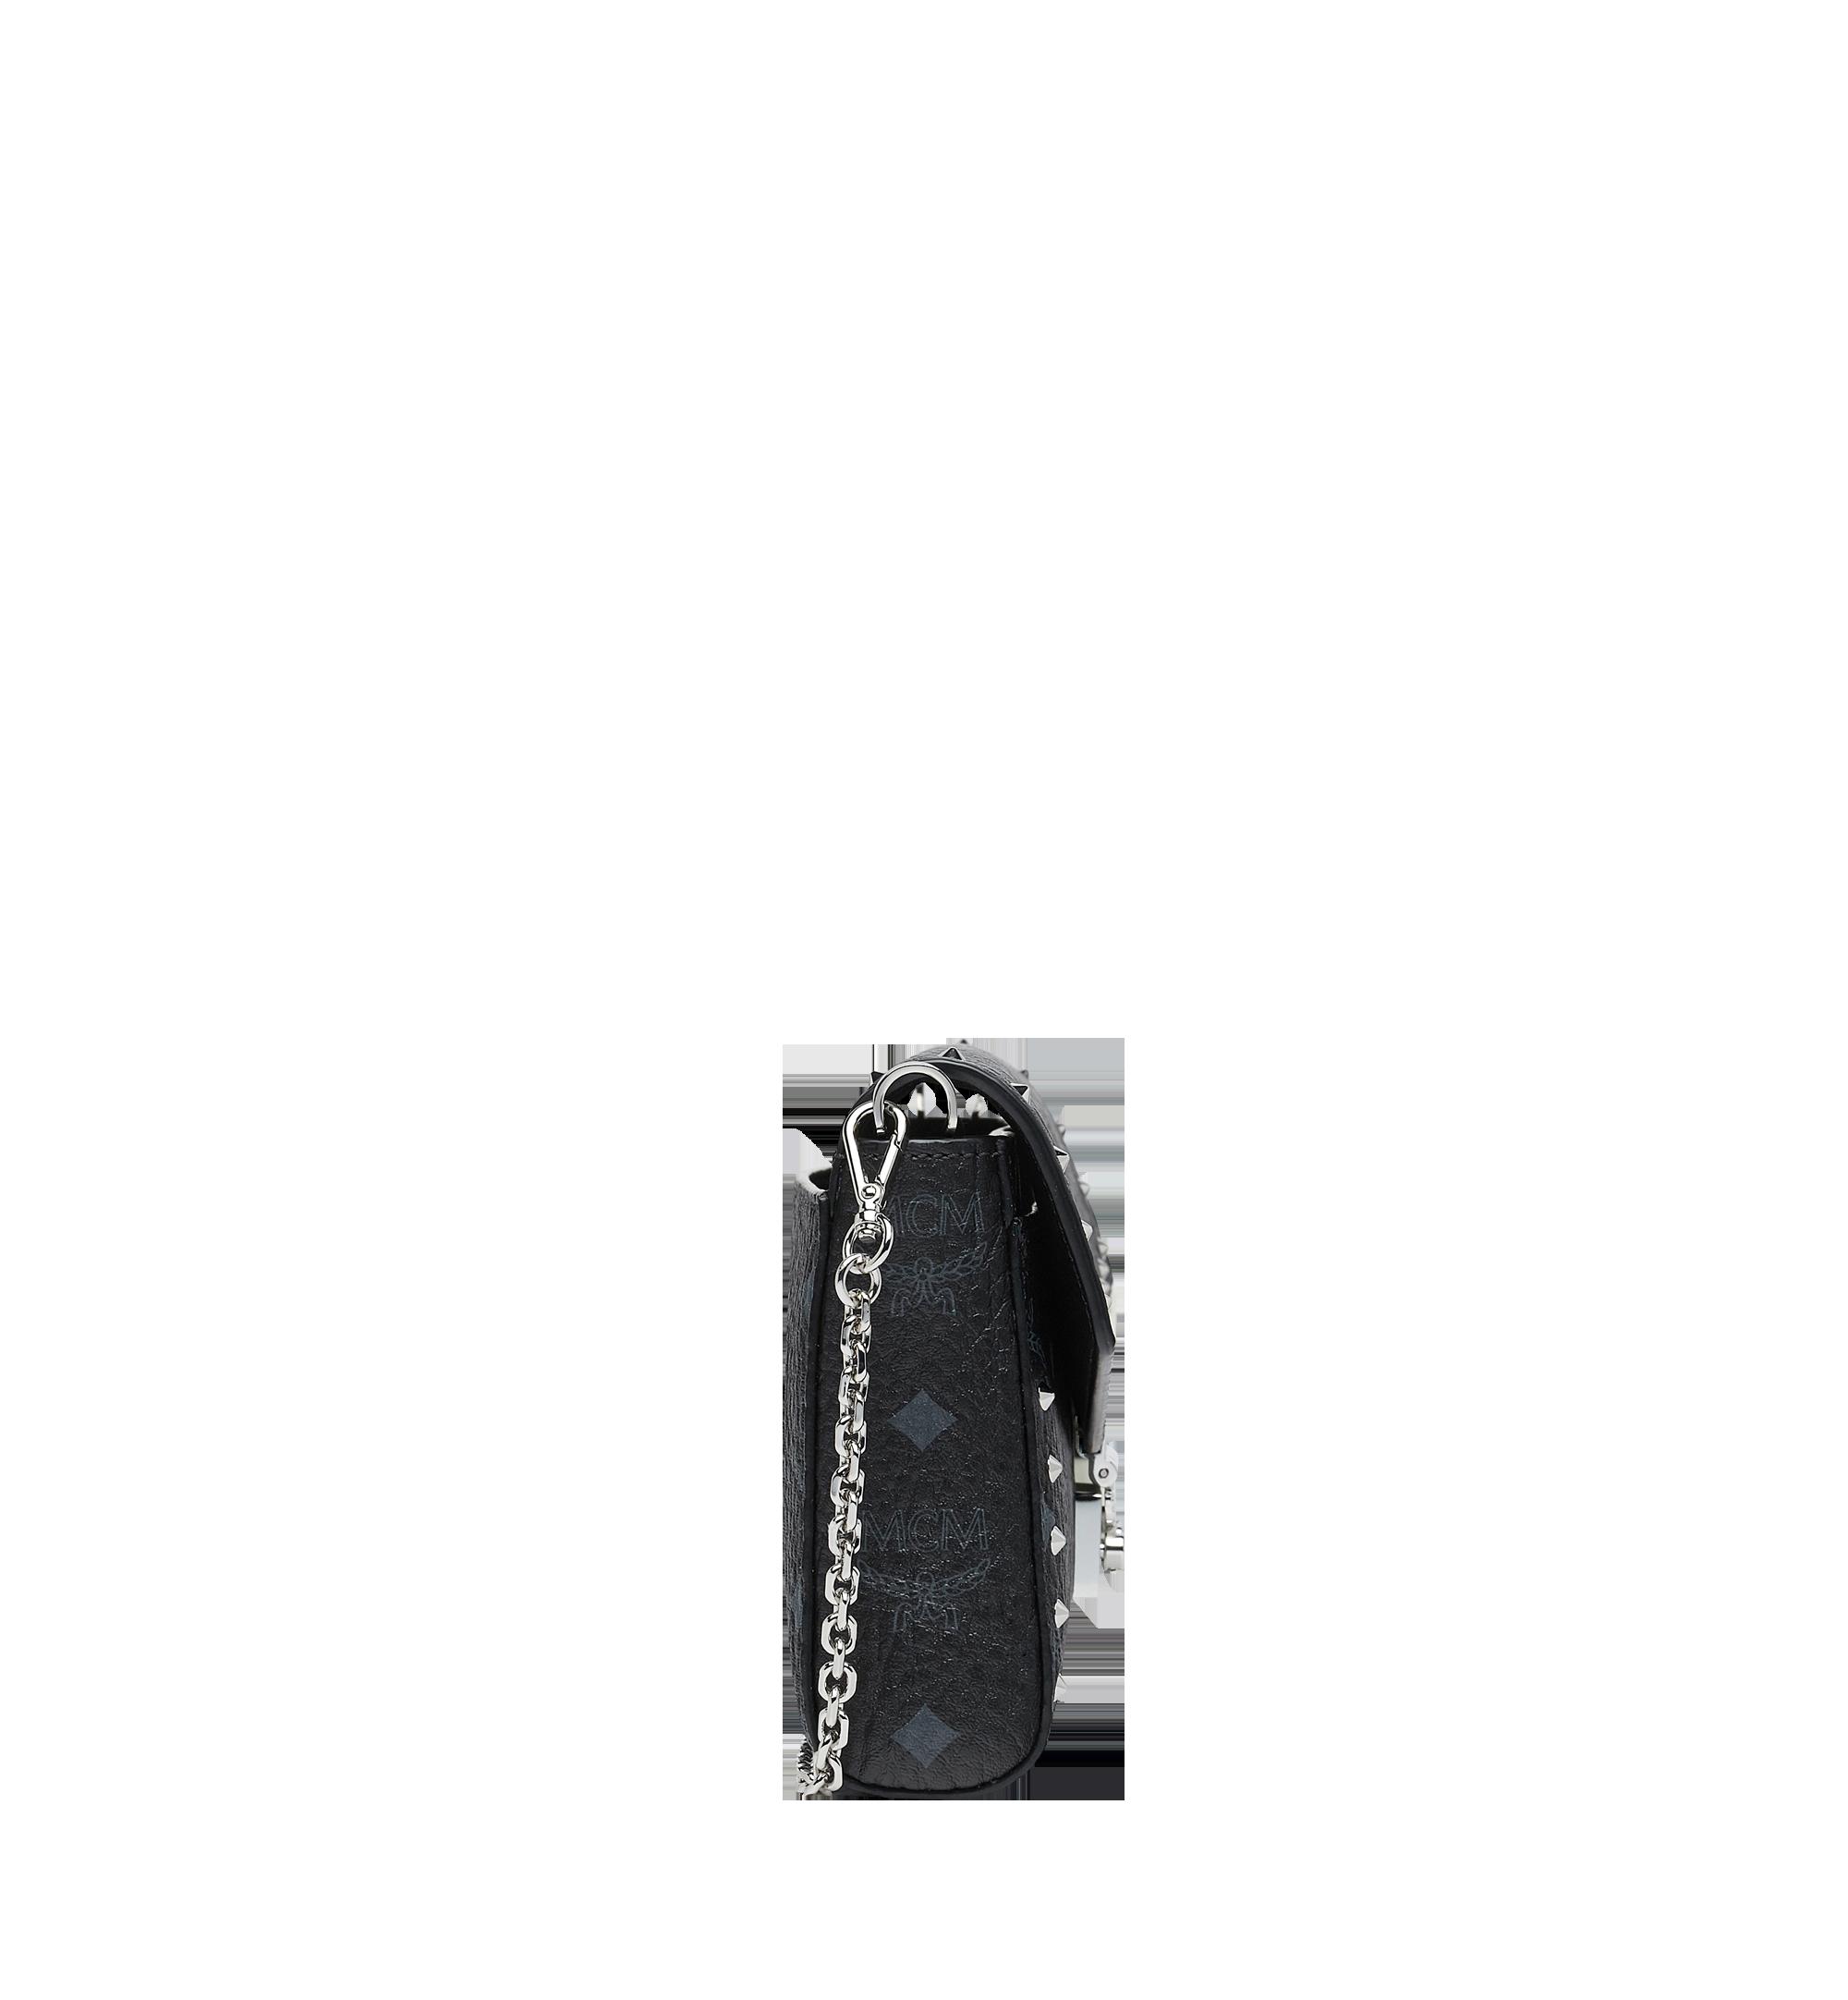 MCM 밀리 스터디드 아웃라인 비세토스 플랩 크로스바디 Black MYZ9SME26BK001 Alternate View 3